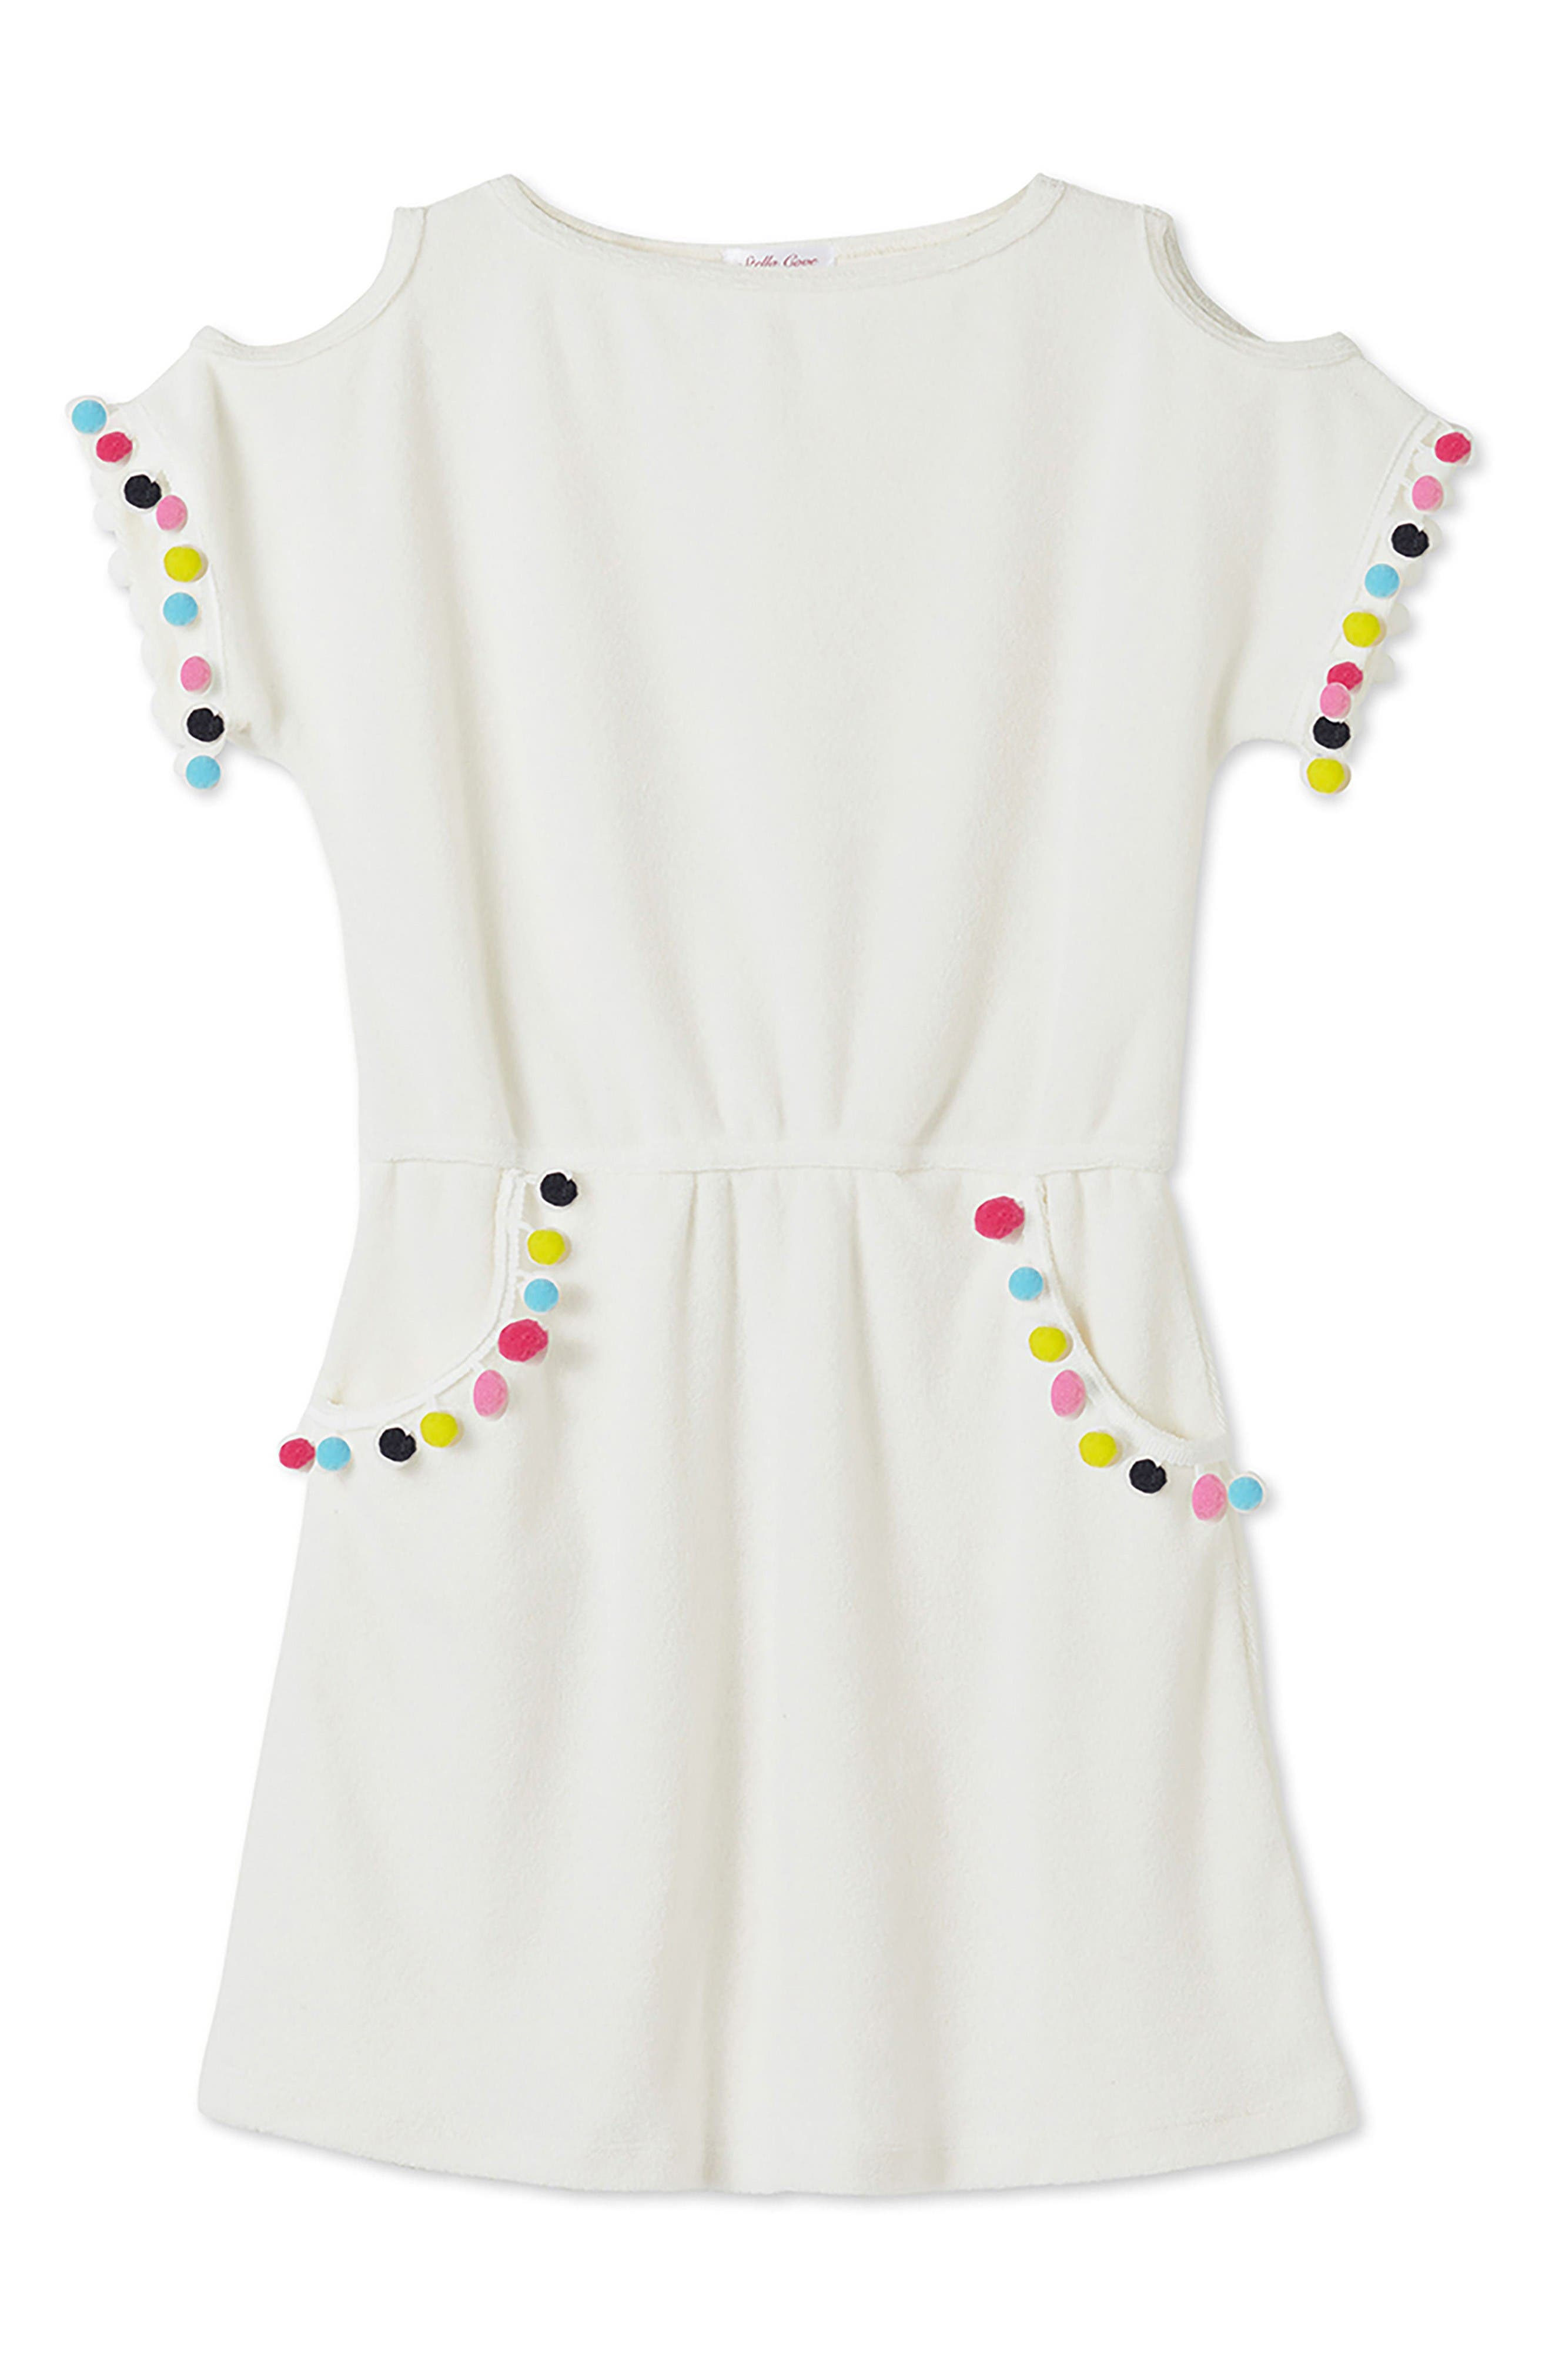 Main Image - Stella Cove Pompom Dress (Toddler Girls, Little Girls & Big Girls)